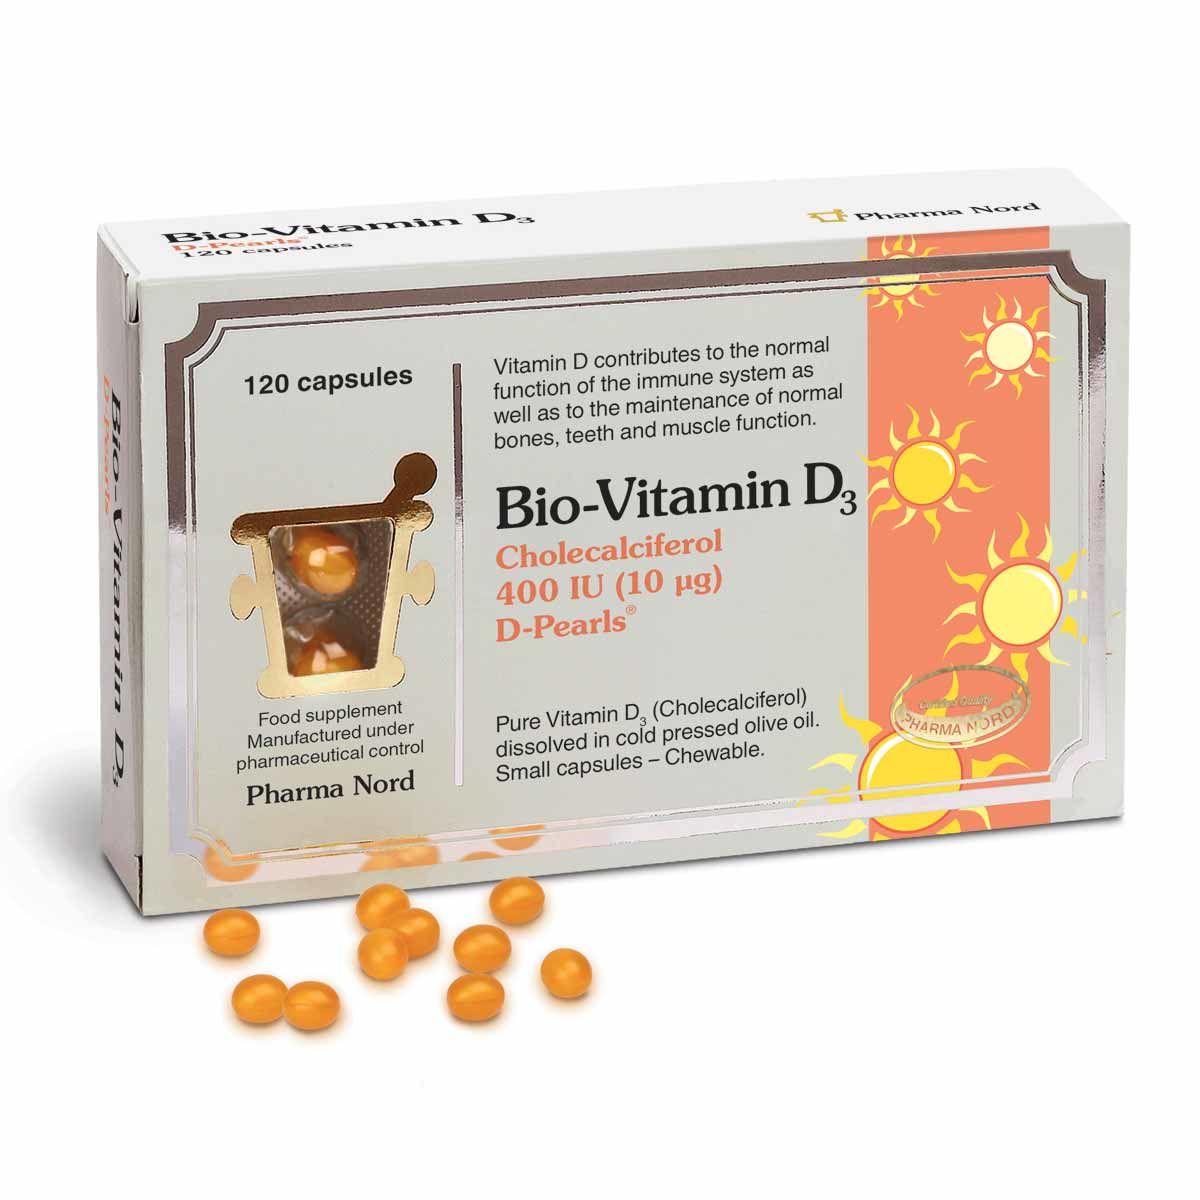 Bio-Vitamin D3 400IU 120's